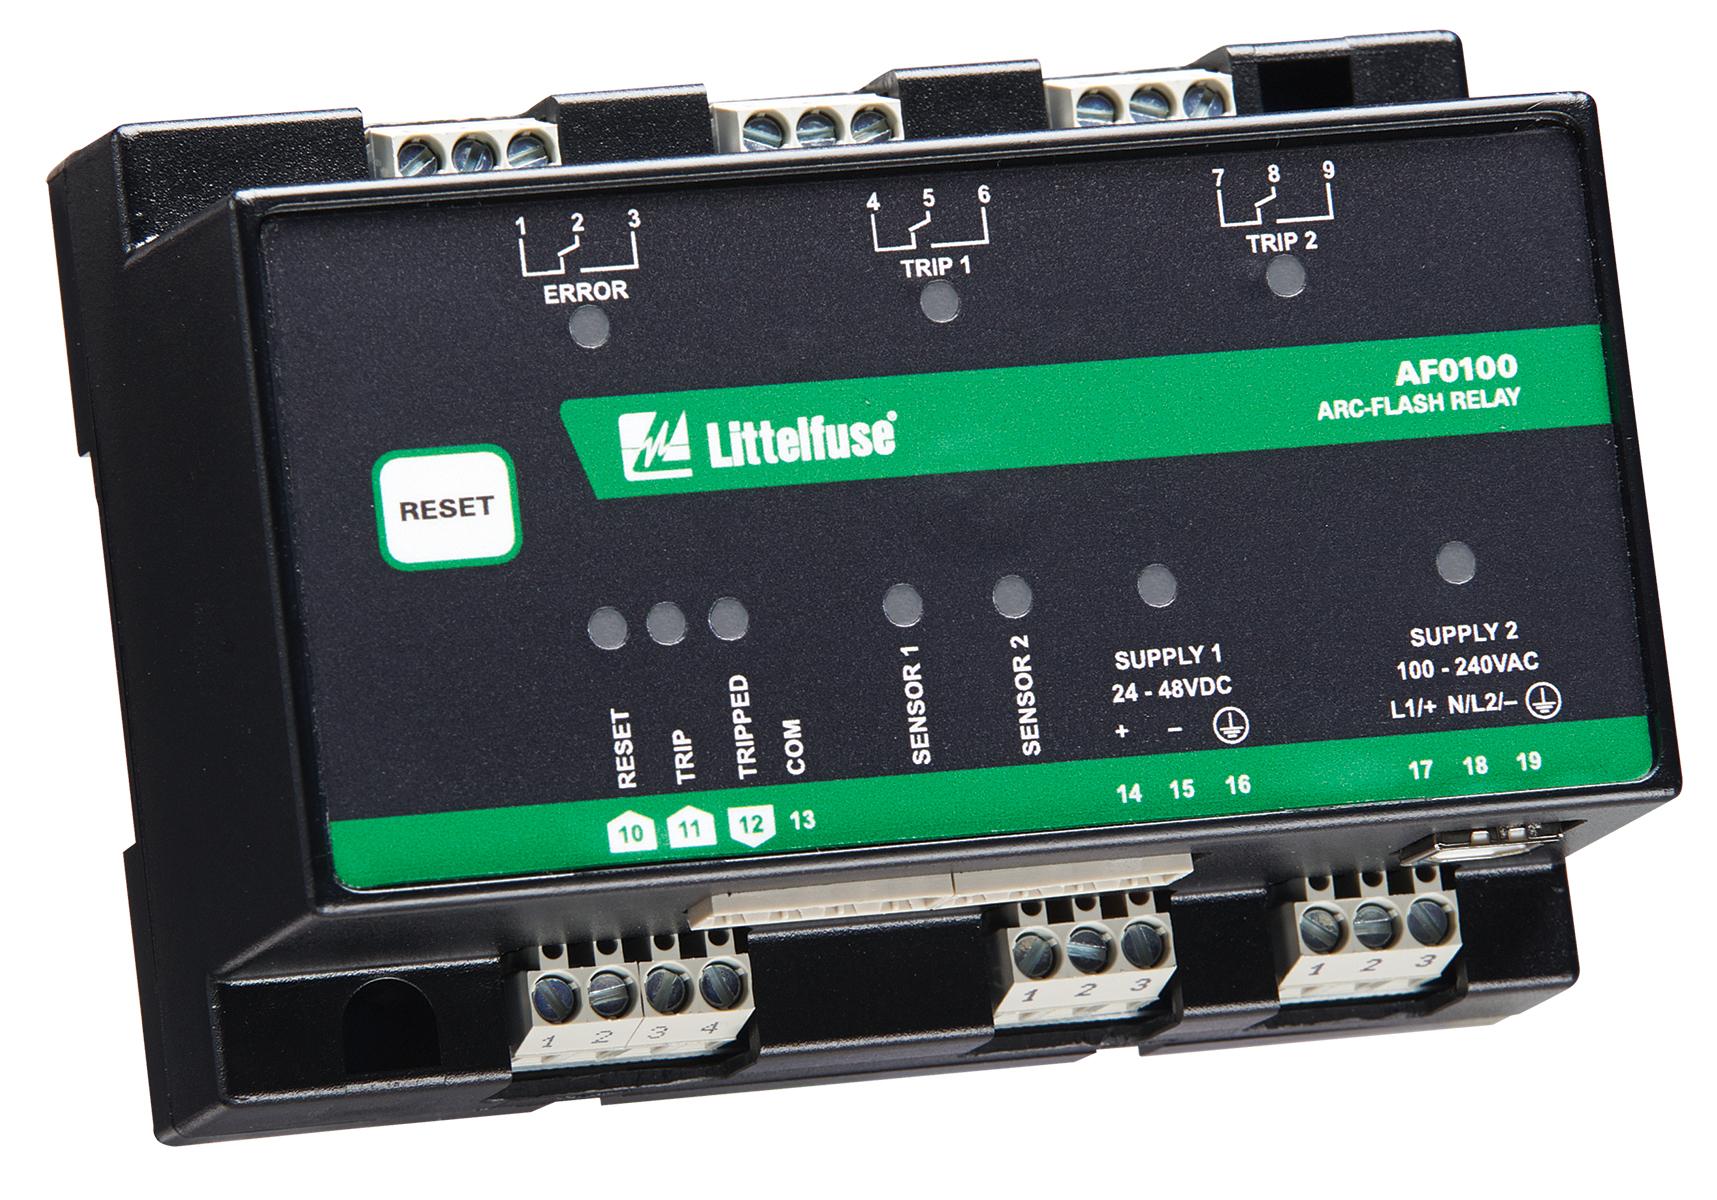 A Littelfuse arc-flash relay.